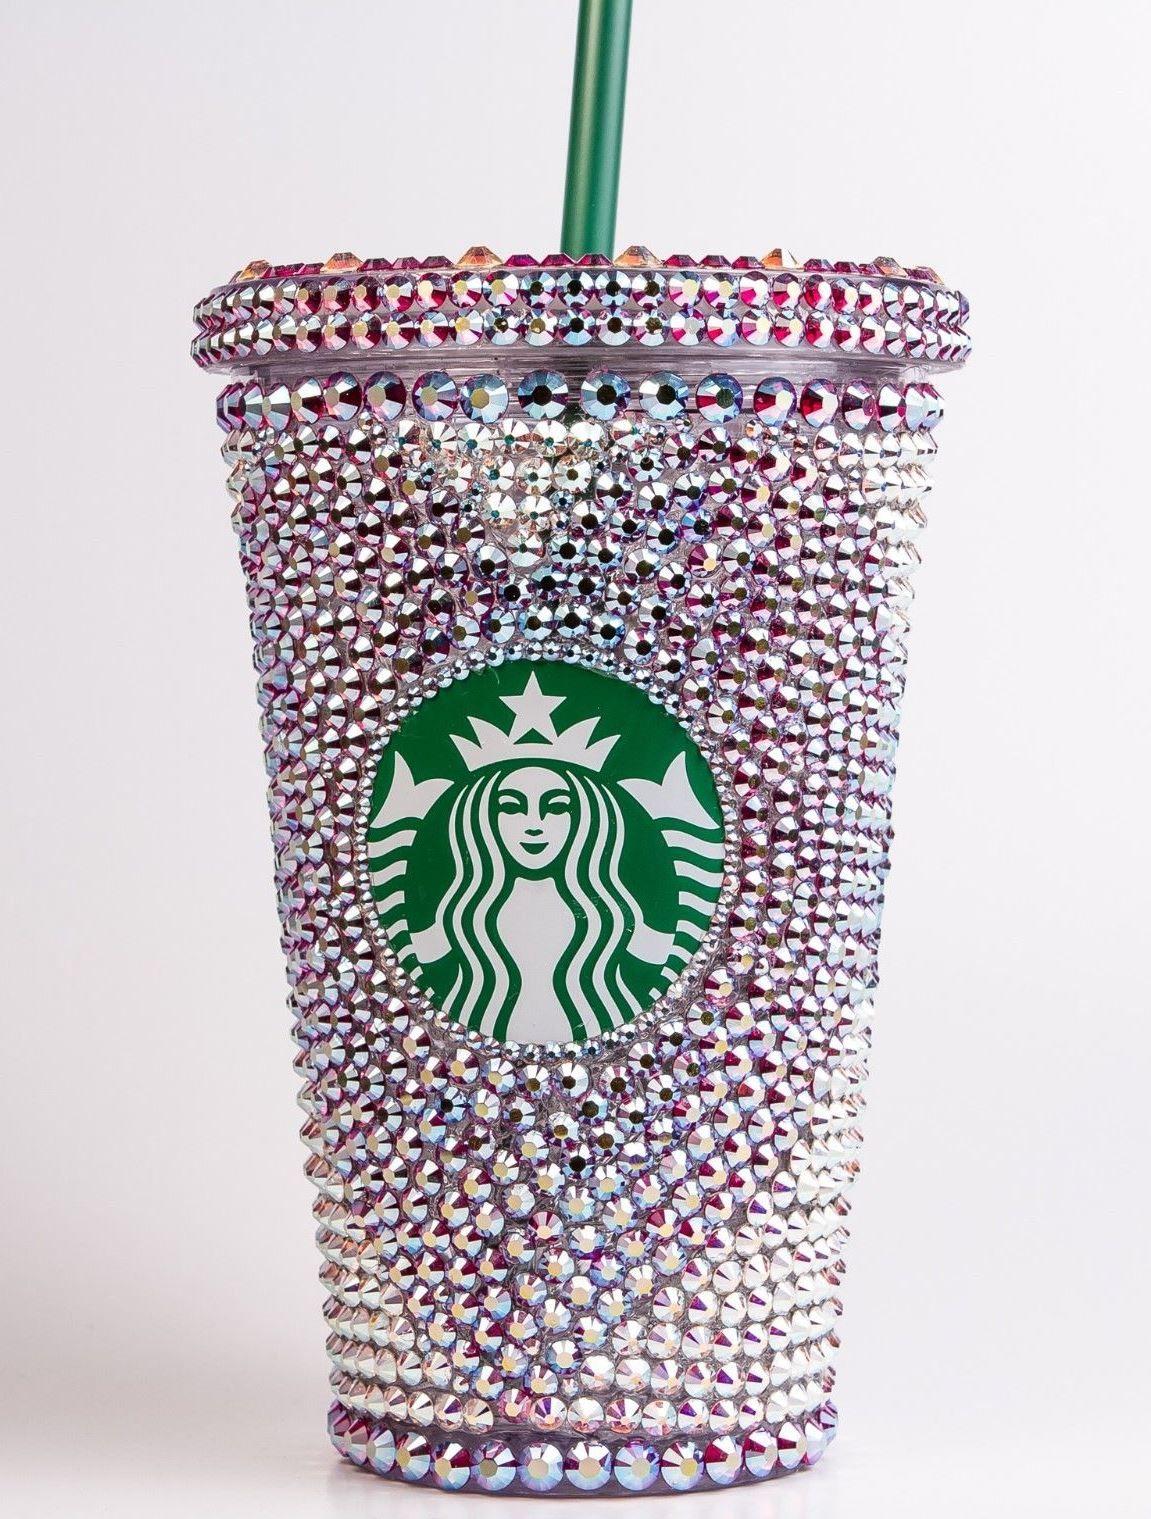 Swarovski Crystal Starbucks Tumbler Called Cameron With Hearts And Flowers Swarovski Crystal Starbucks Starbucks Starbucks Lovers Starbucks Cups